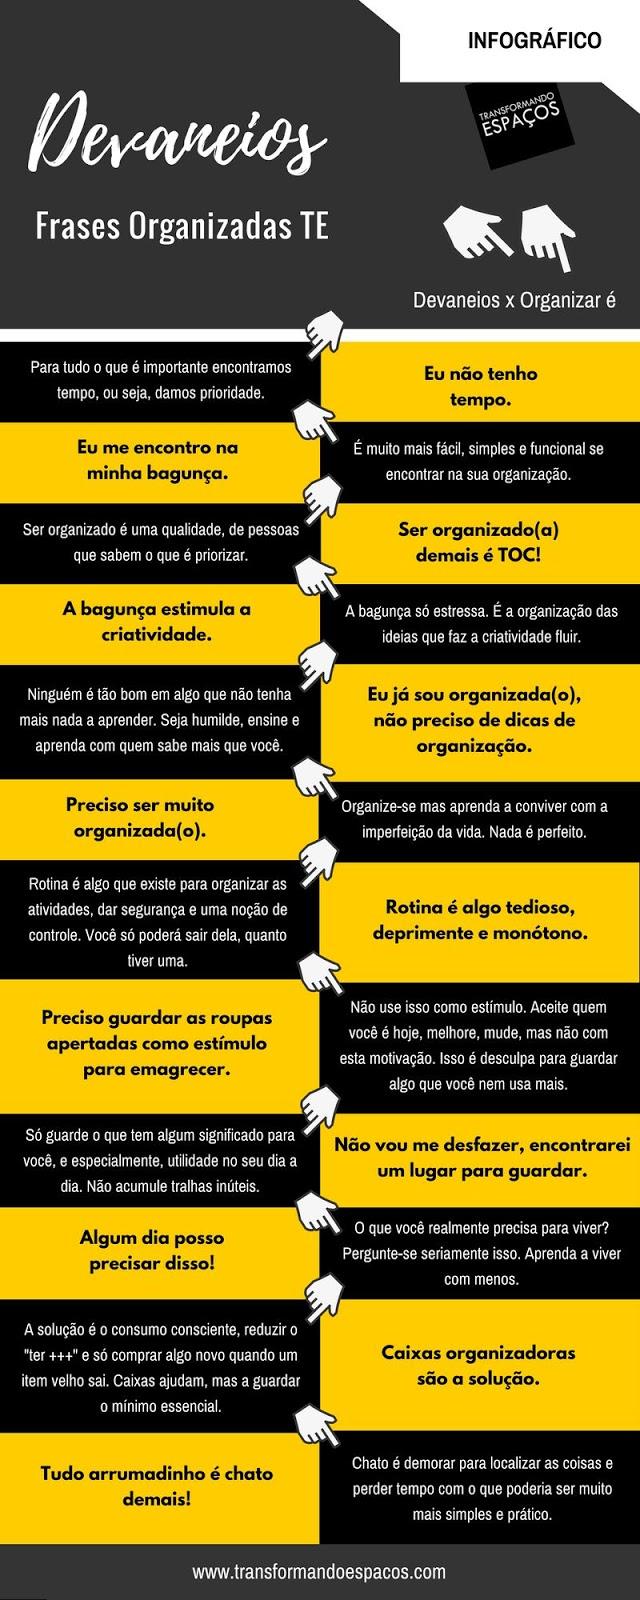 Infográfico: Frases Organizadas TE #Devaneios